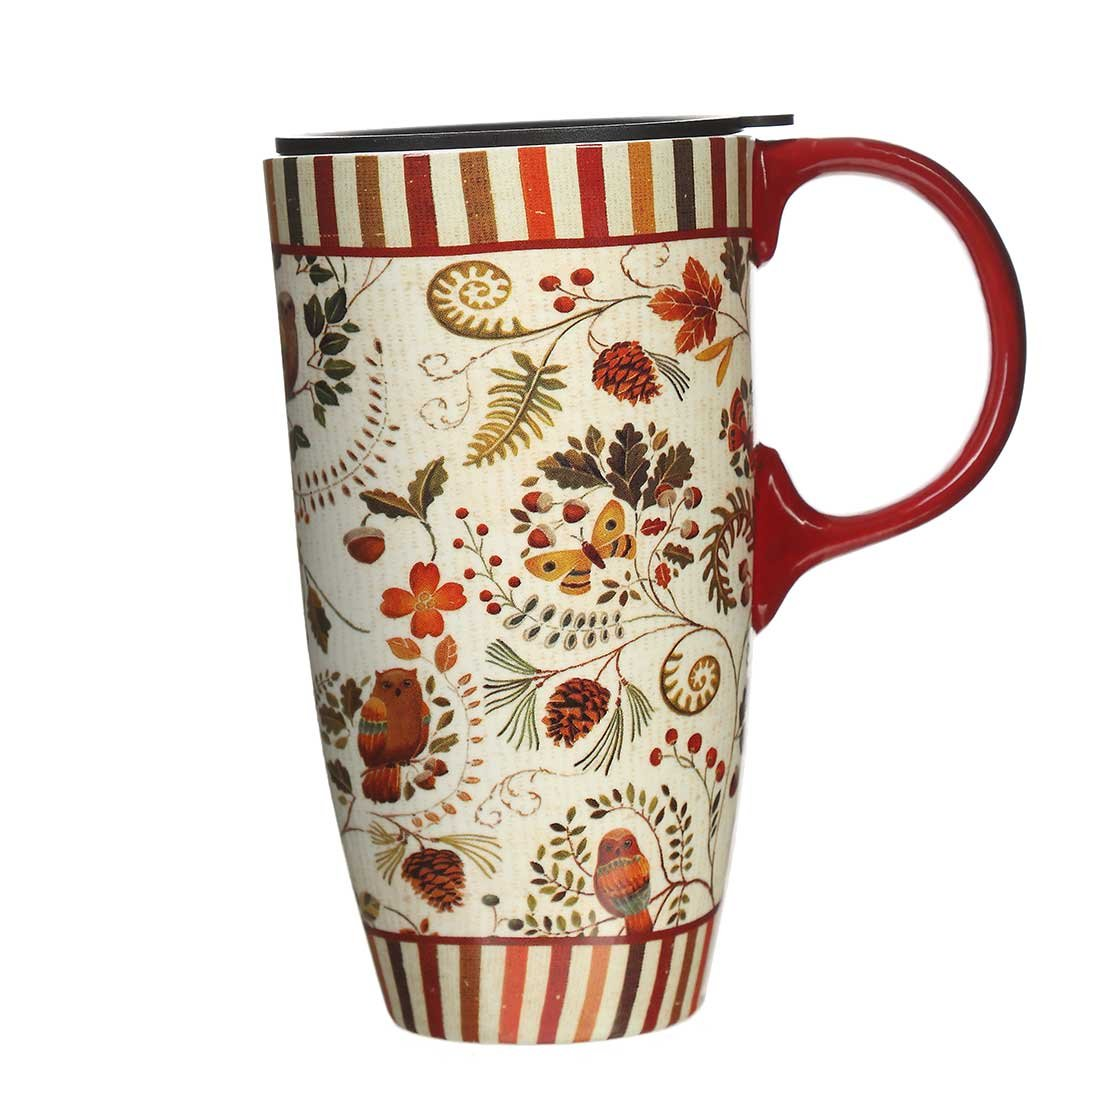 Cypress Home Tall Ceramic Travel Mug Coffee Cup with Lid 17oz.Purple Flower LTD